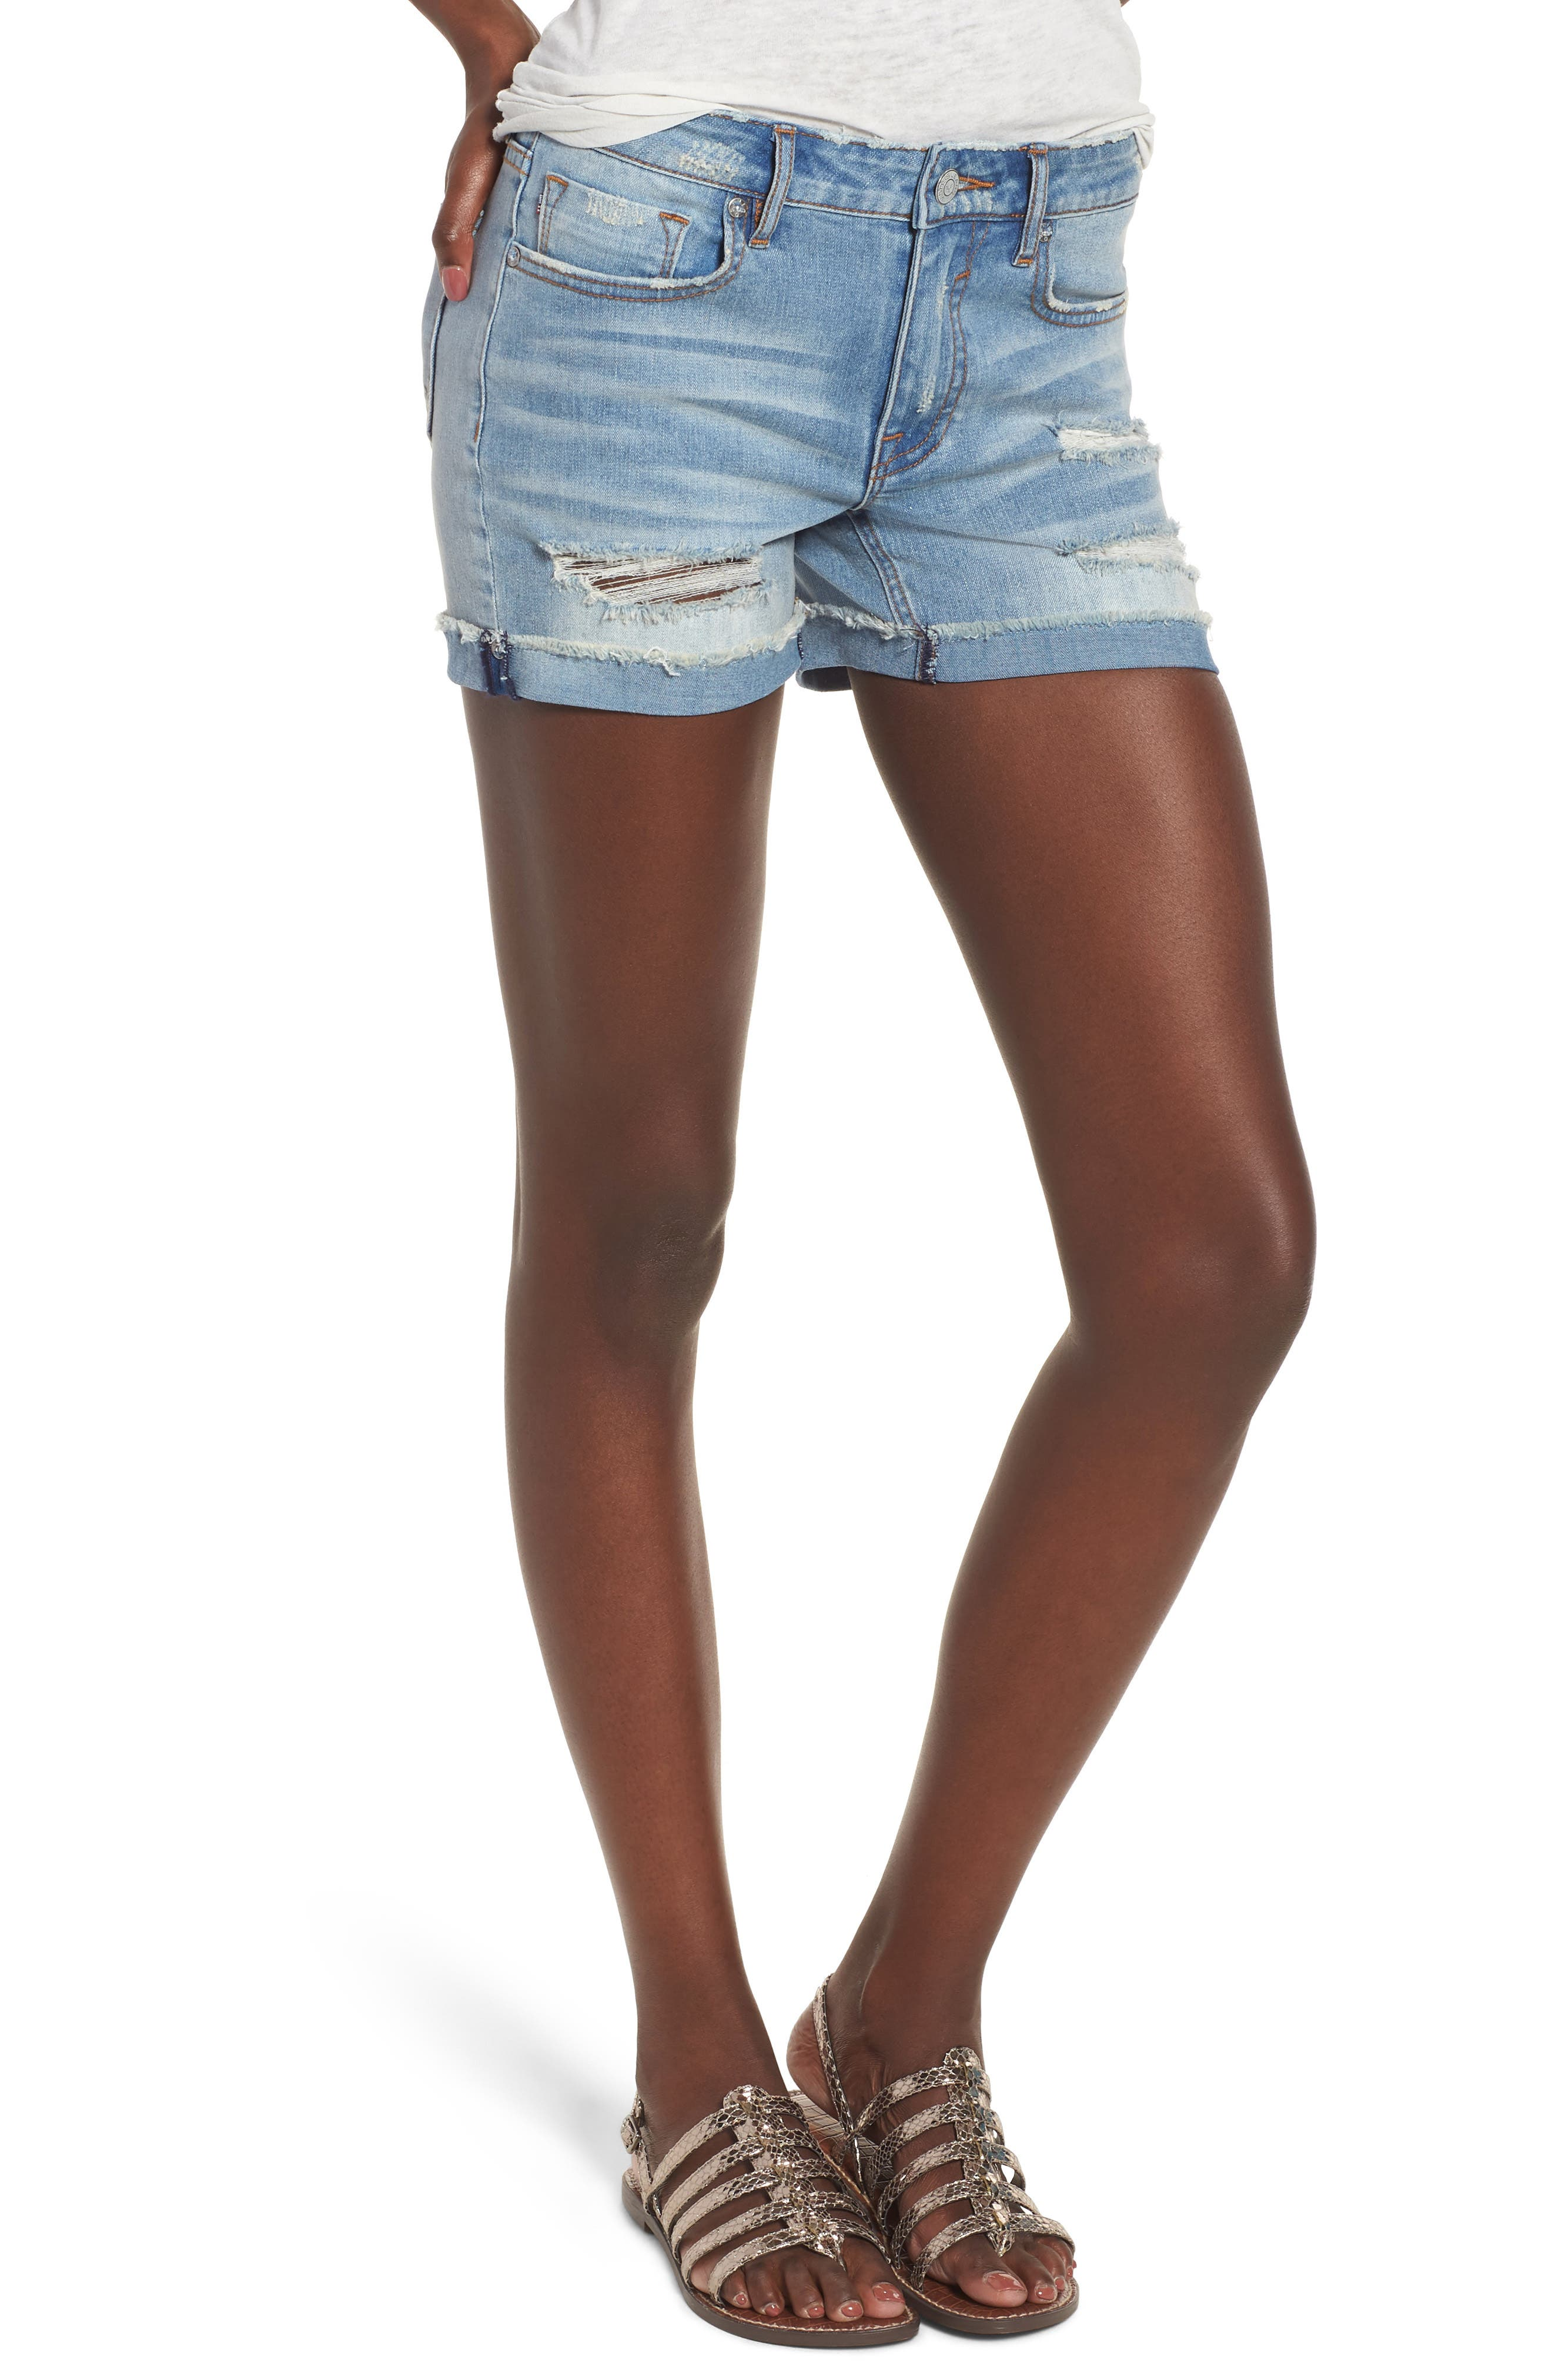 Marley Denim Shorts,                         Main,                         color, Light Wash